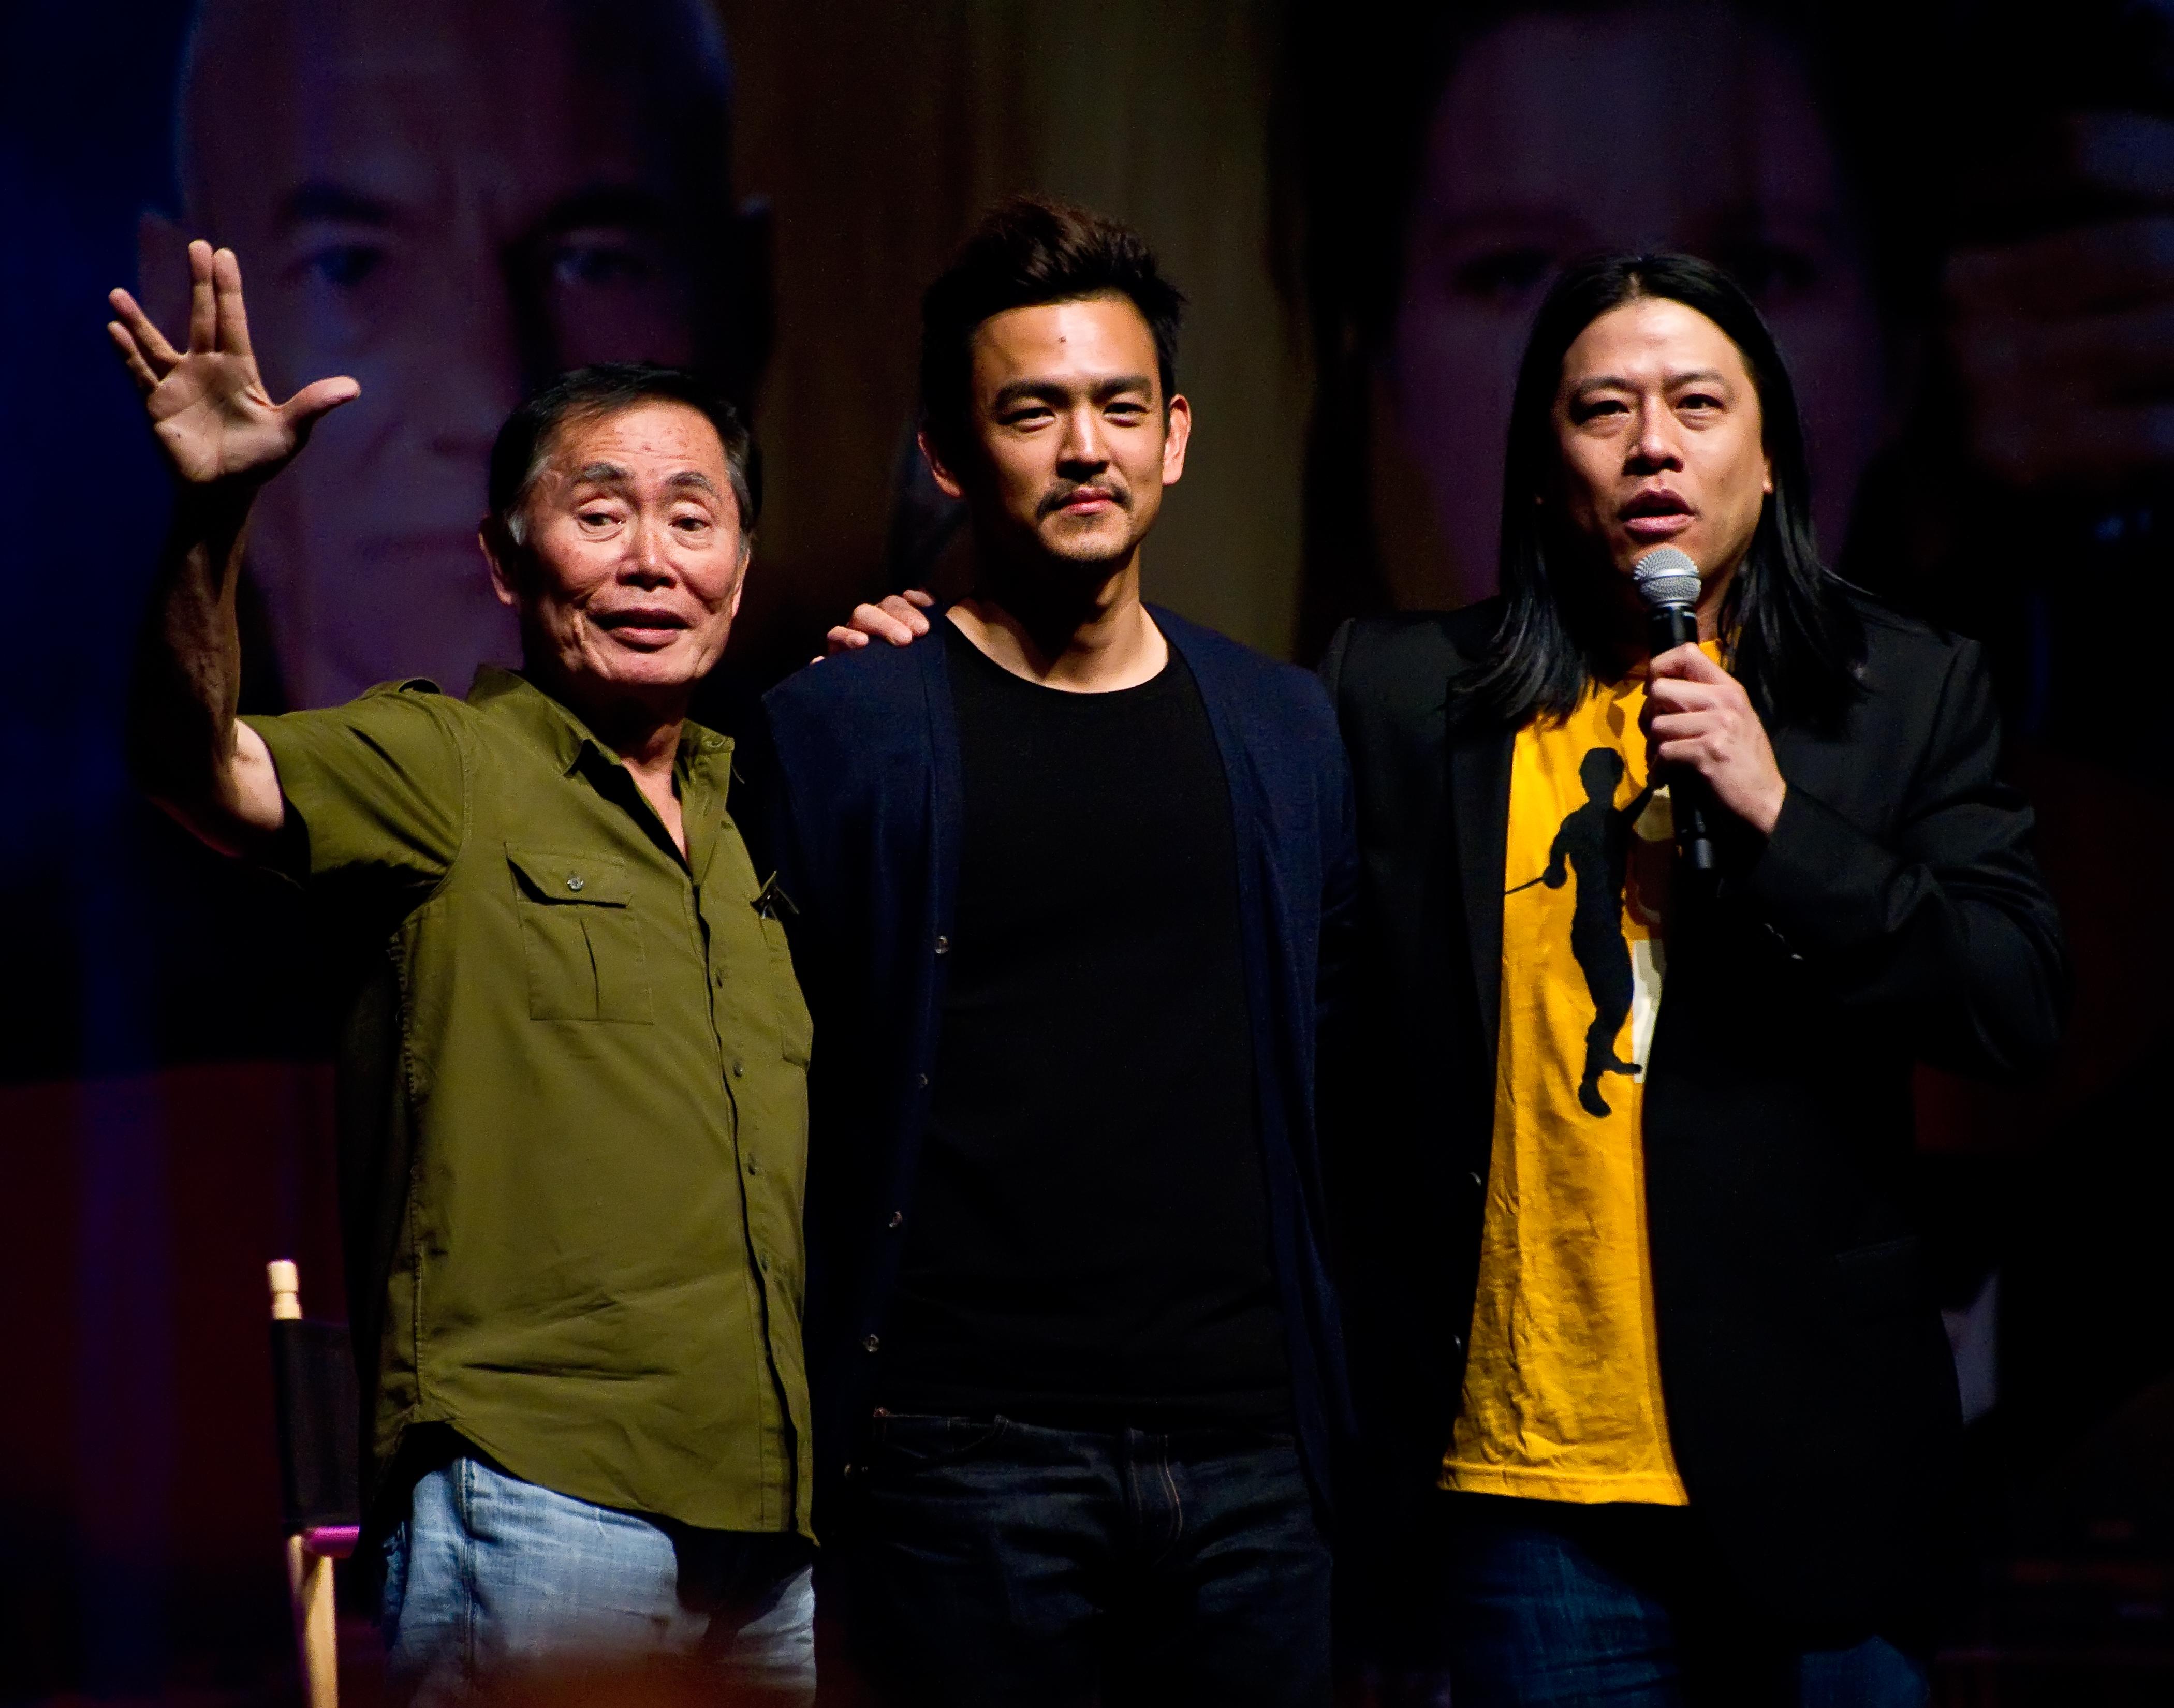 (Left to right) George Takei, John Cho, and Garrett Wang.